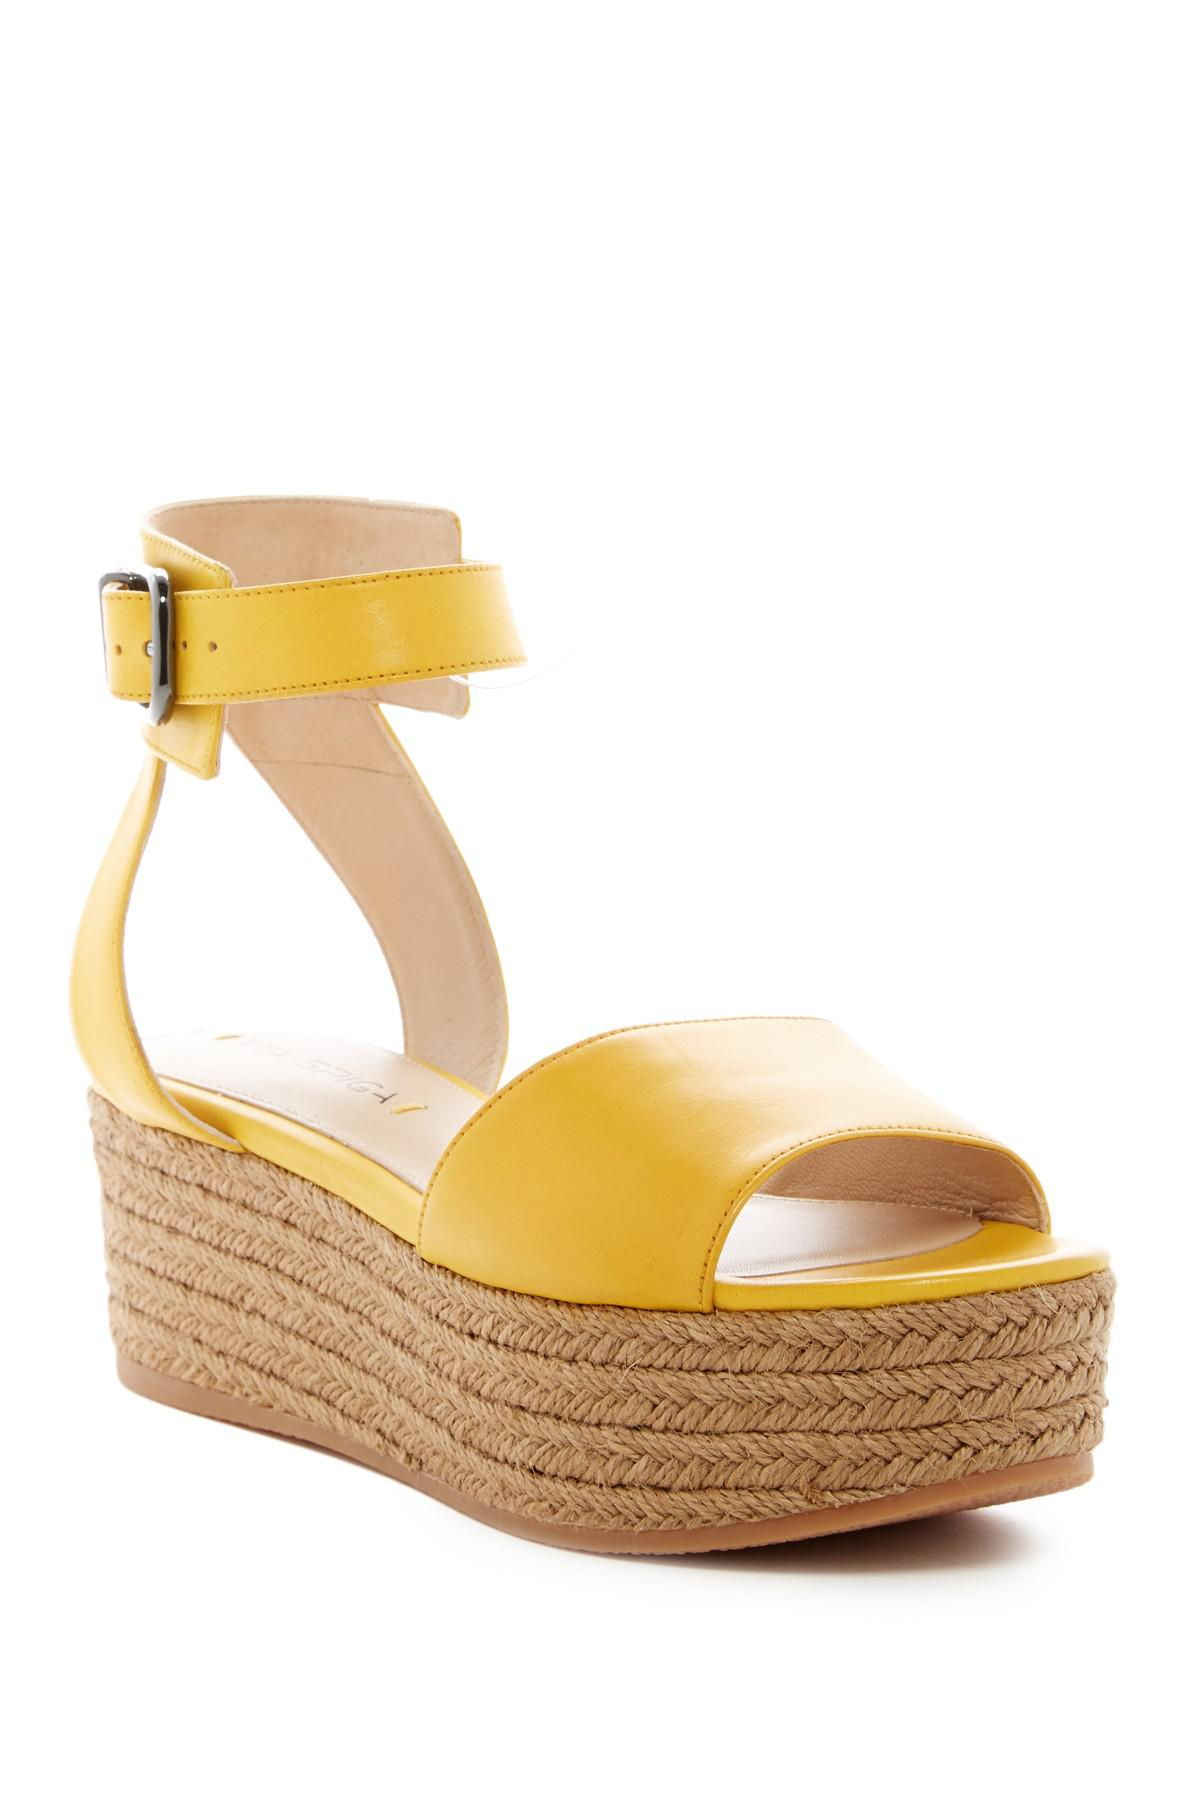 c116a6ce3777 Lyst - Via Spiga Nemy Platform Sandal in Yellow